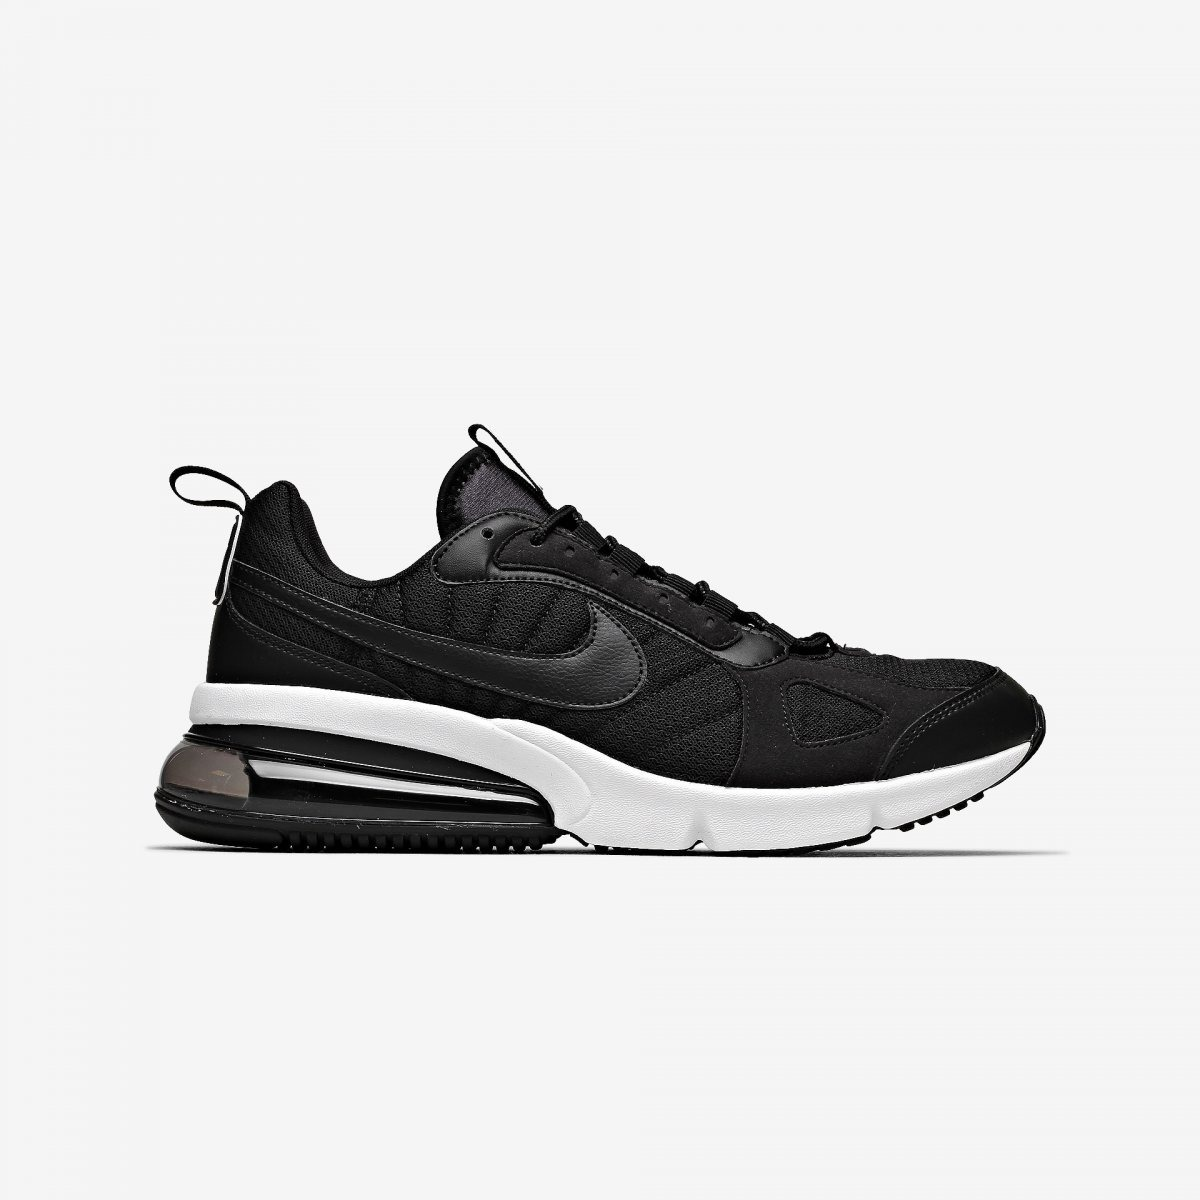 finest selection 3d3e7 6effb Nike Air Max 270 Futura Black- White Original X Pedido